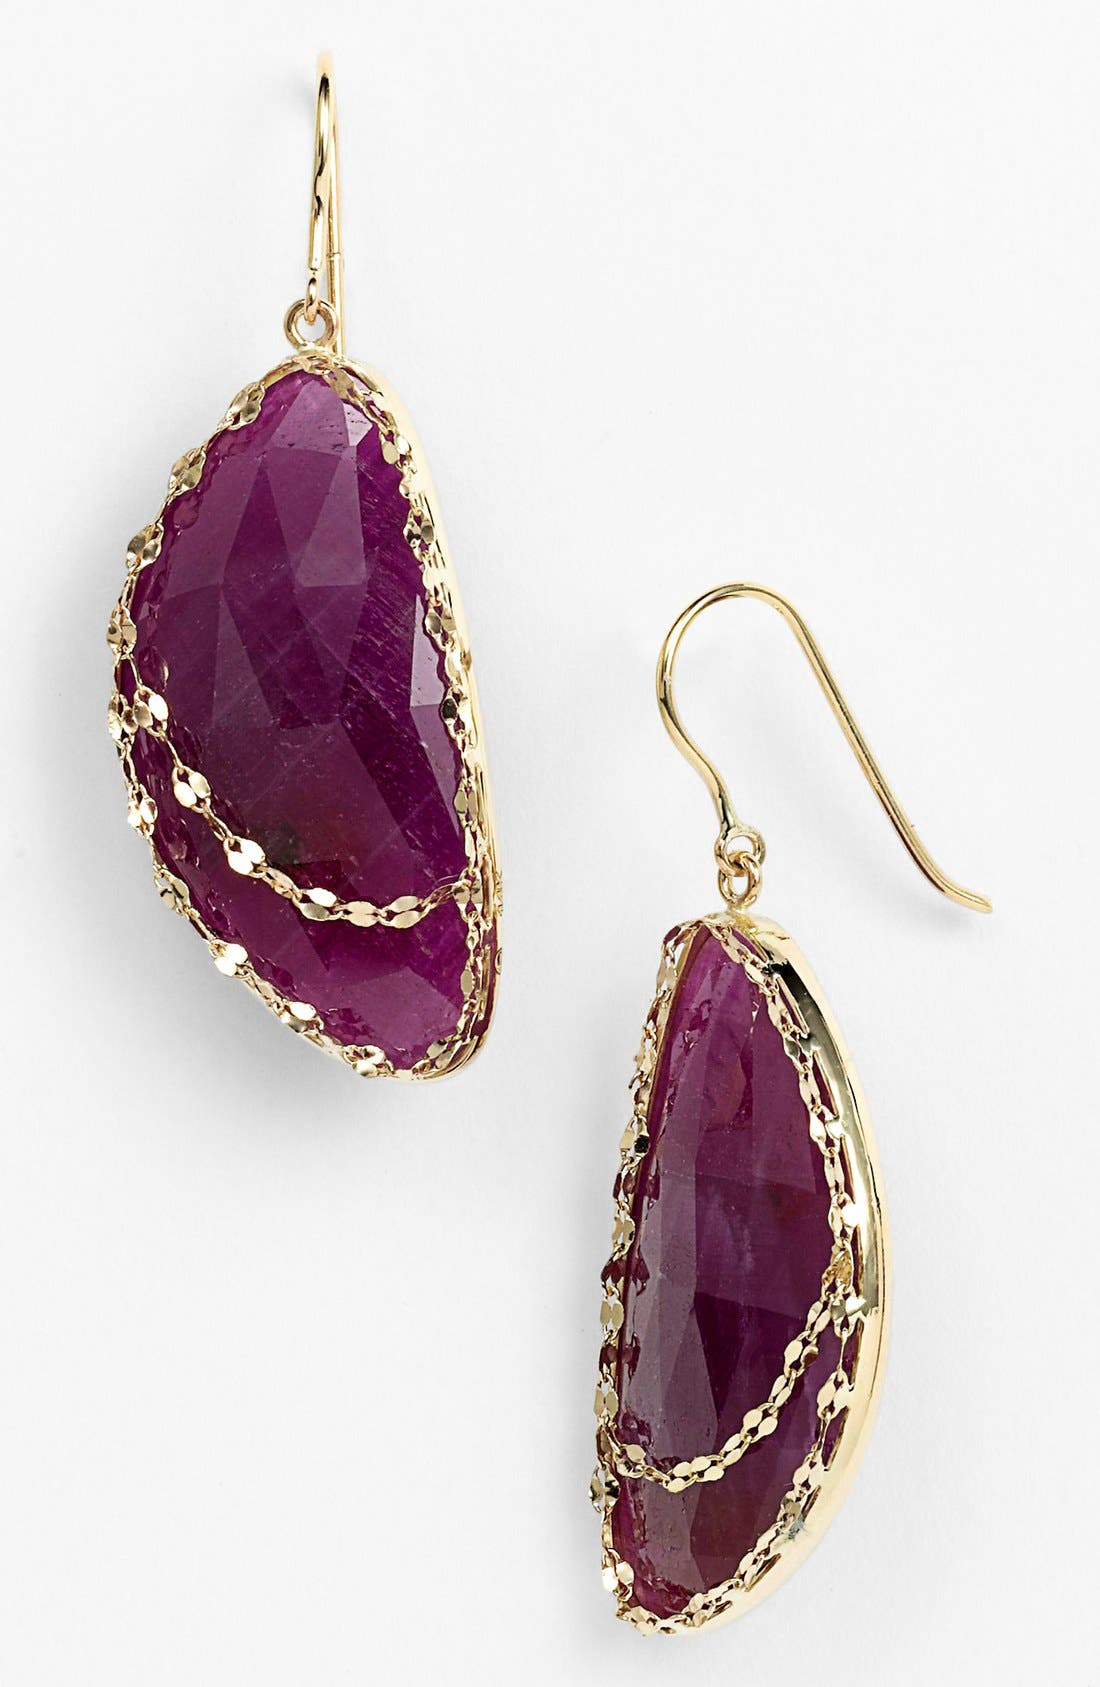 Alternate Image 1 Selected - Lana Jewelry 'Stone Gold - Eden' Sapphire Drop Earrings